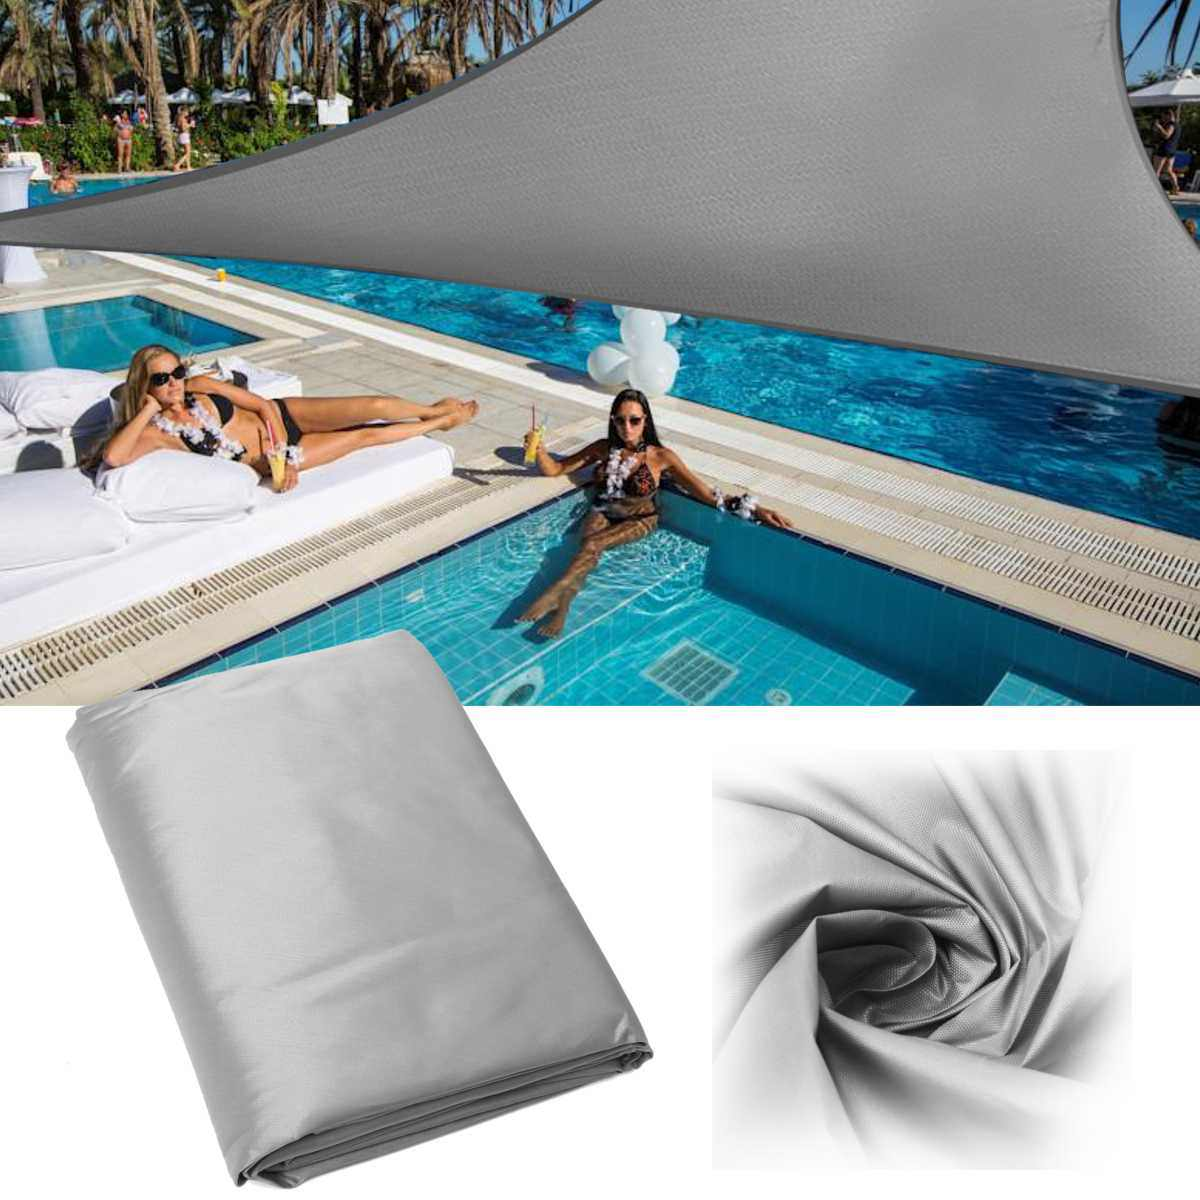 5x5x5M triángulo sombra vela red tela exterior piscina impermeable sol sombra vela prevenir dosel UV hogar jardín toldo cubierta